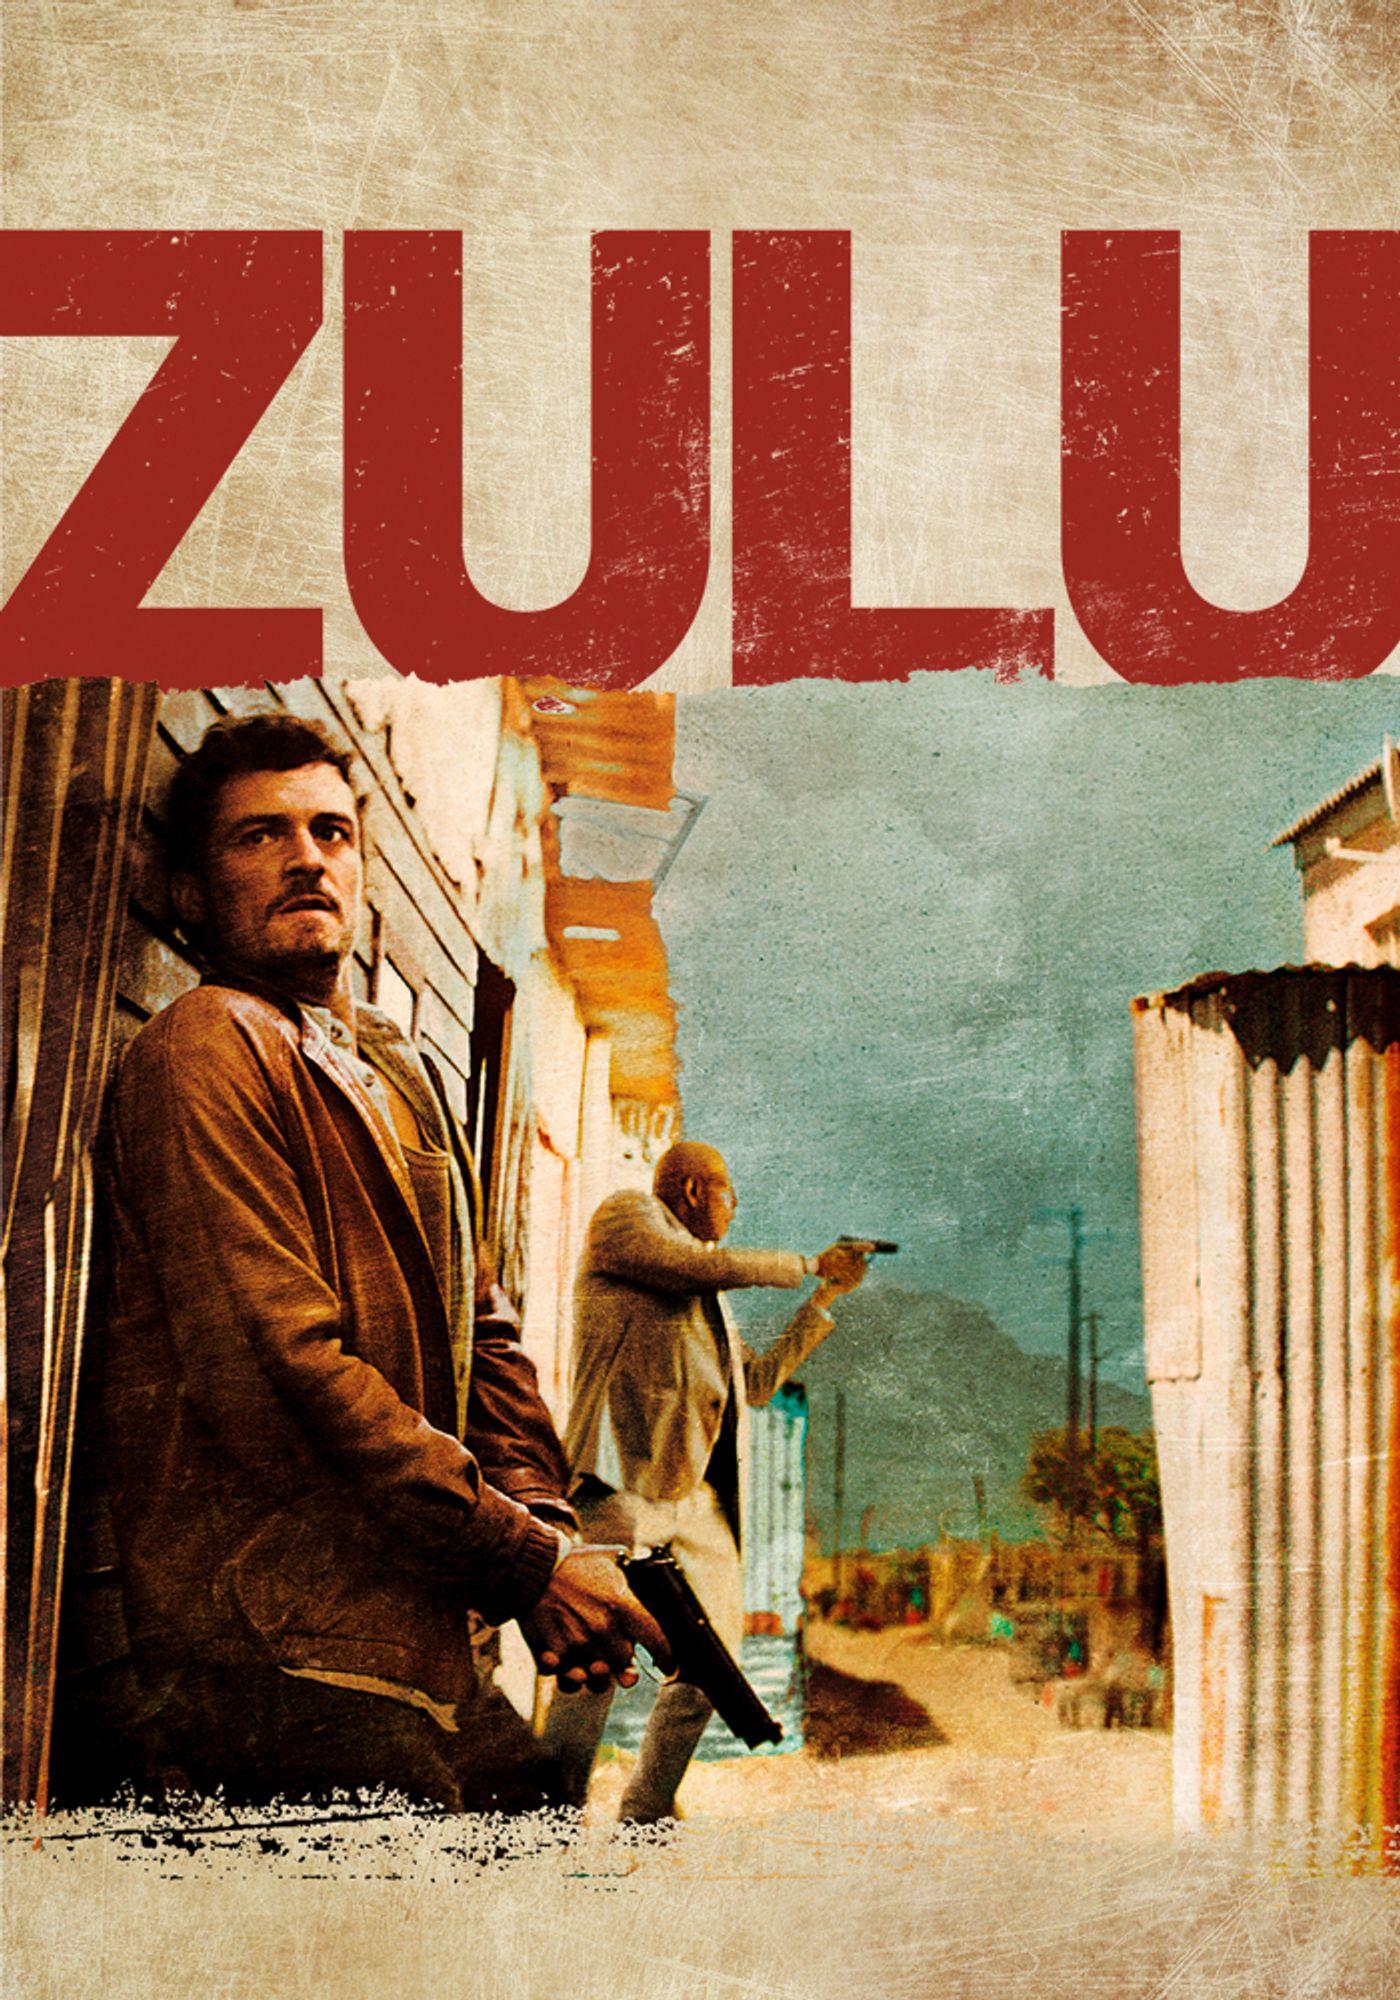 Zulu_MITELE-PLUS_700x1000